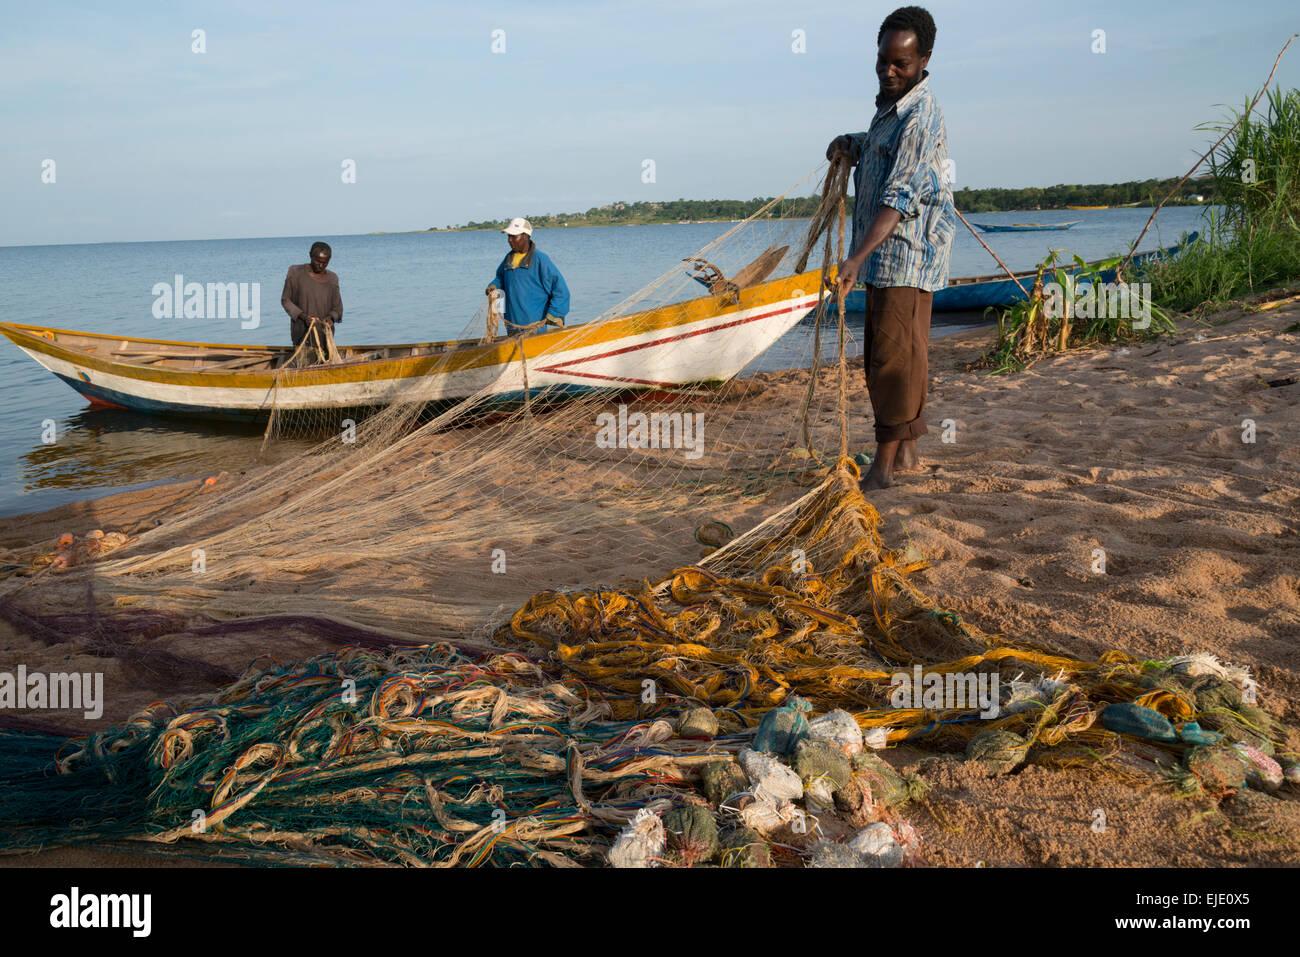 Ukara island. Lake Victoria. Tanzania. - Stock Image